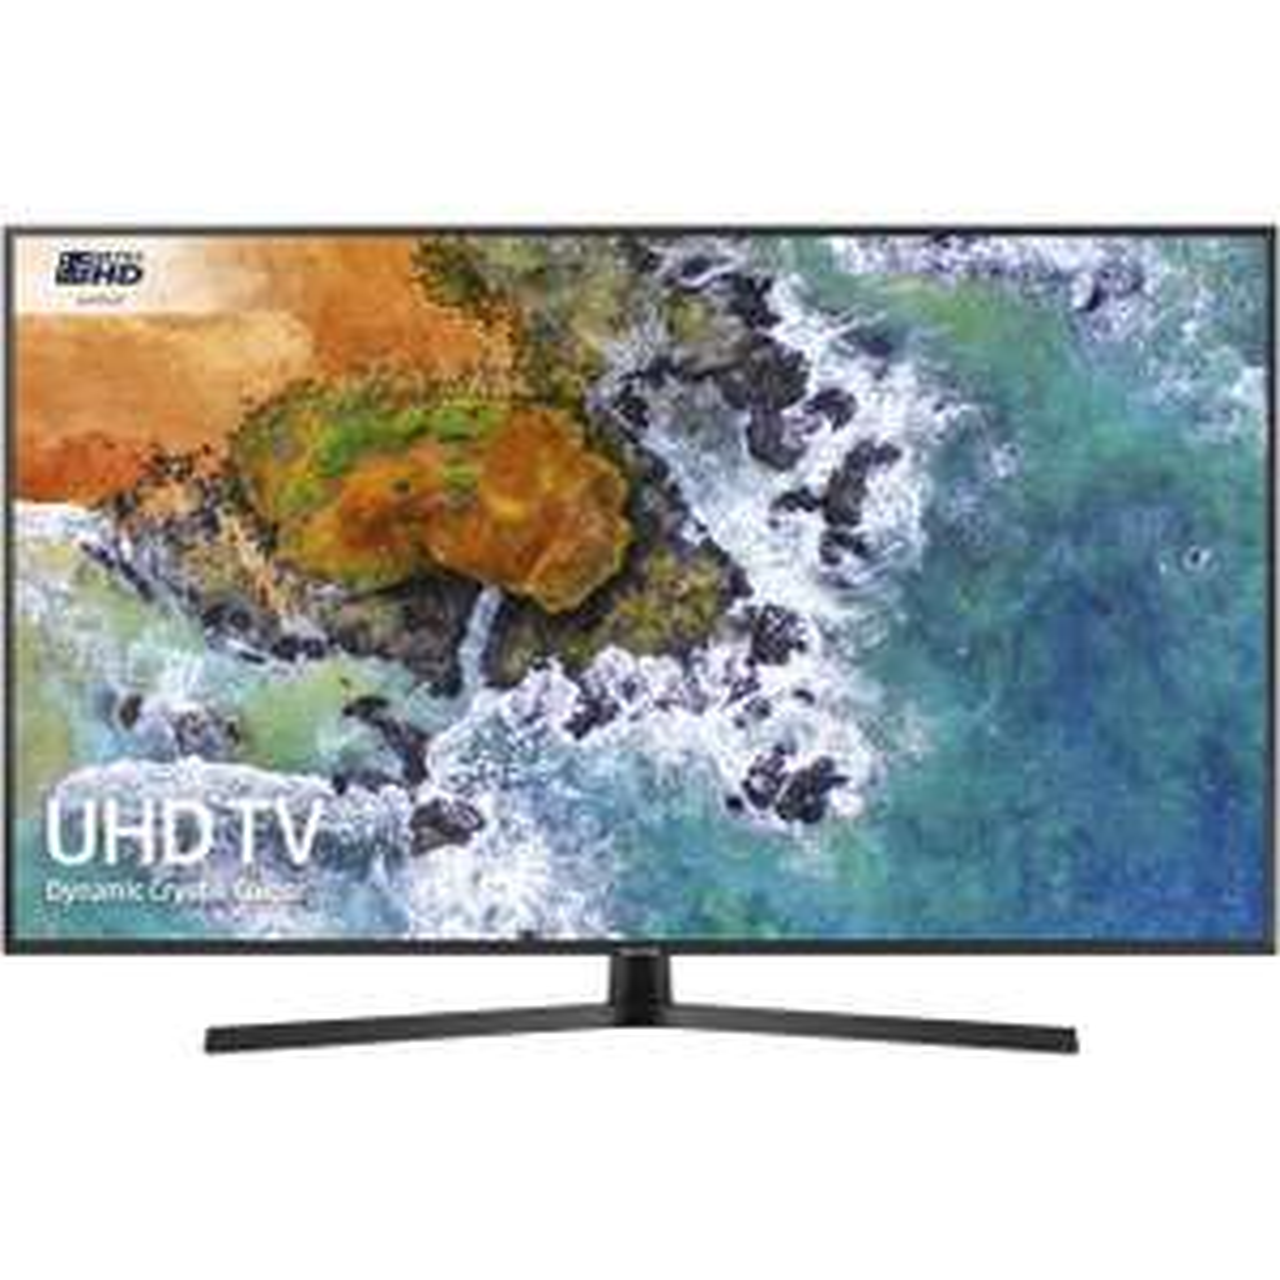 Tv Video Deals Cheap Price Best Sale In Uk Hotukdeals